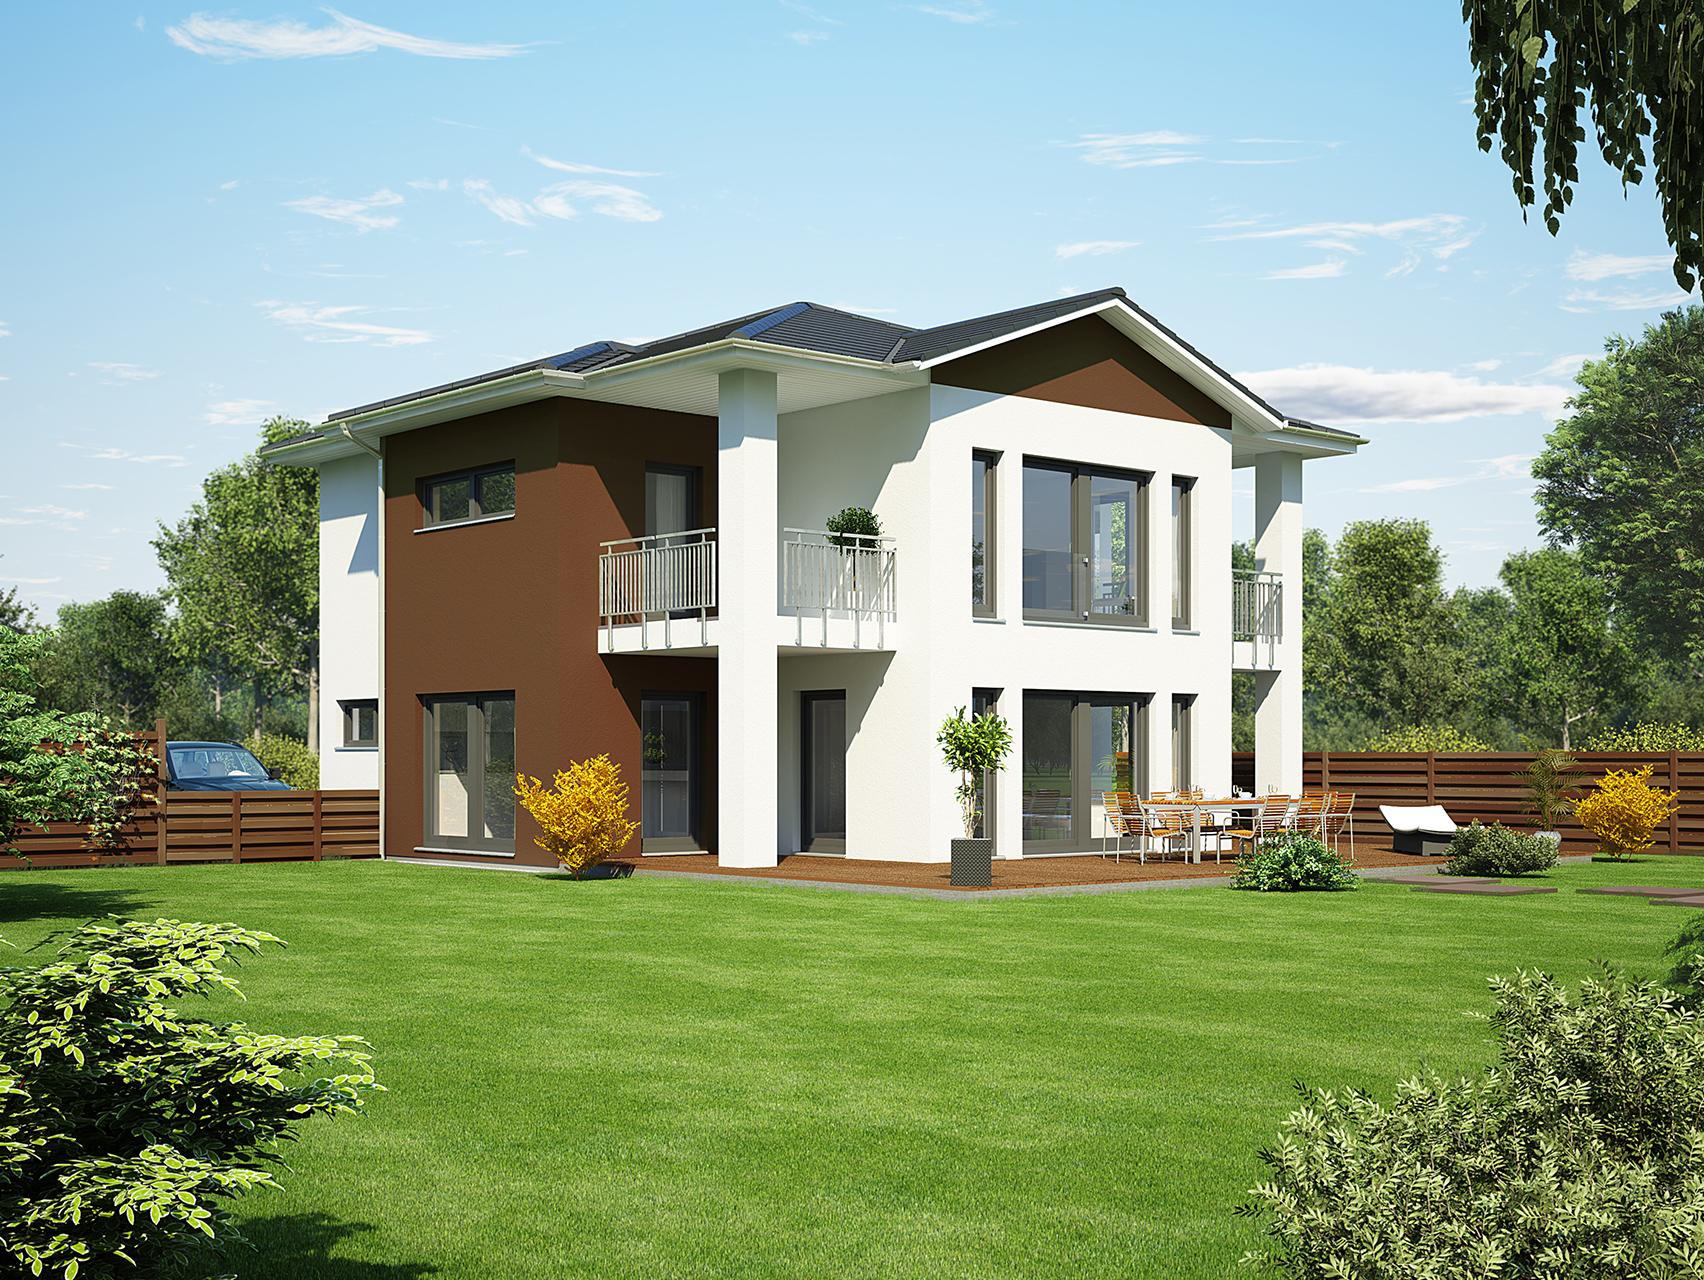 Moderne stadtvilla walmdach  planungsvorschlag_moderne-stadtvilla_43_9sp_1704x1280.jpg